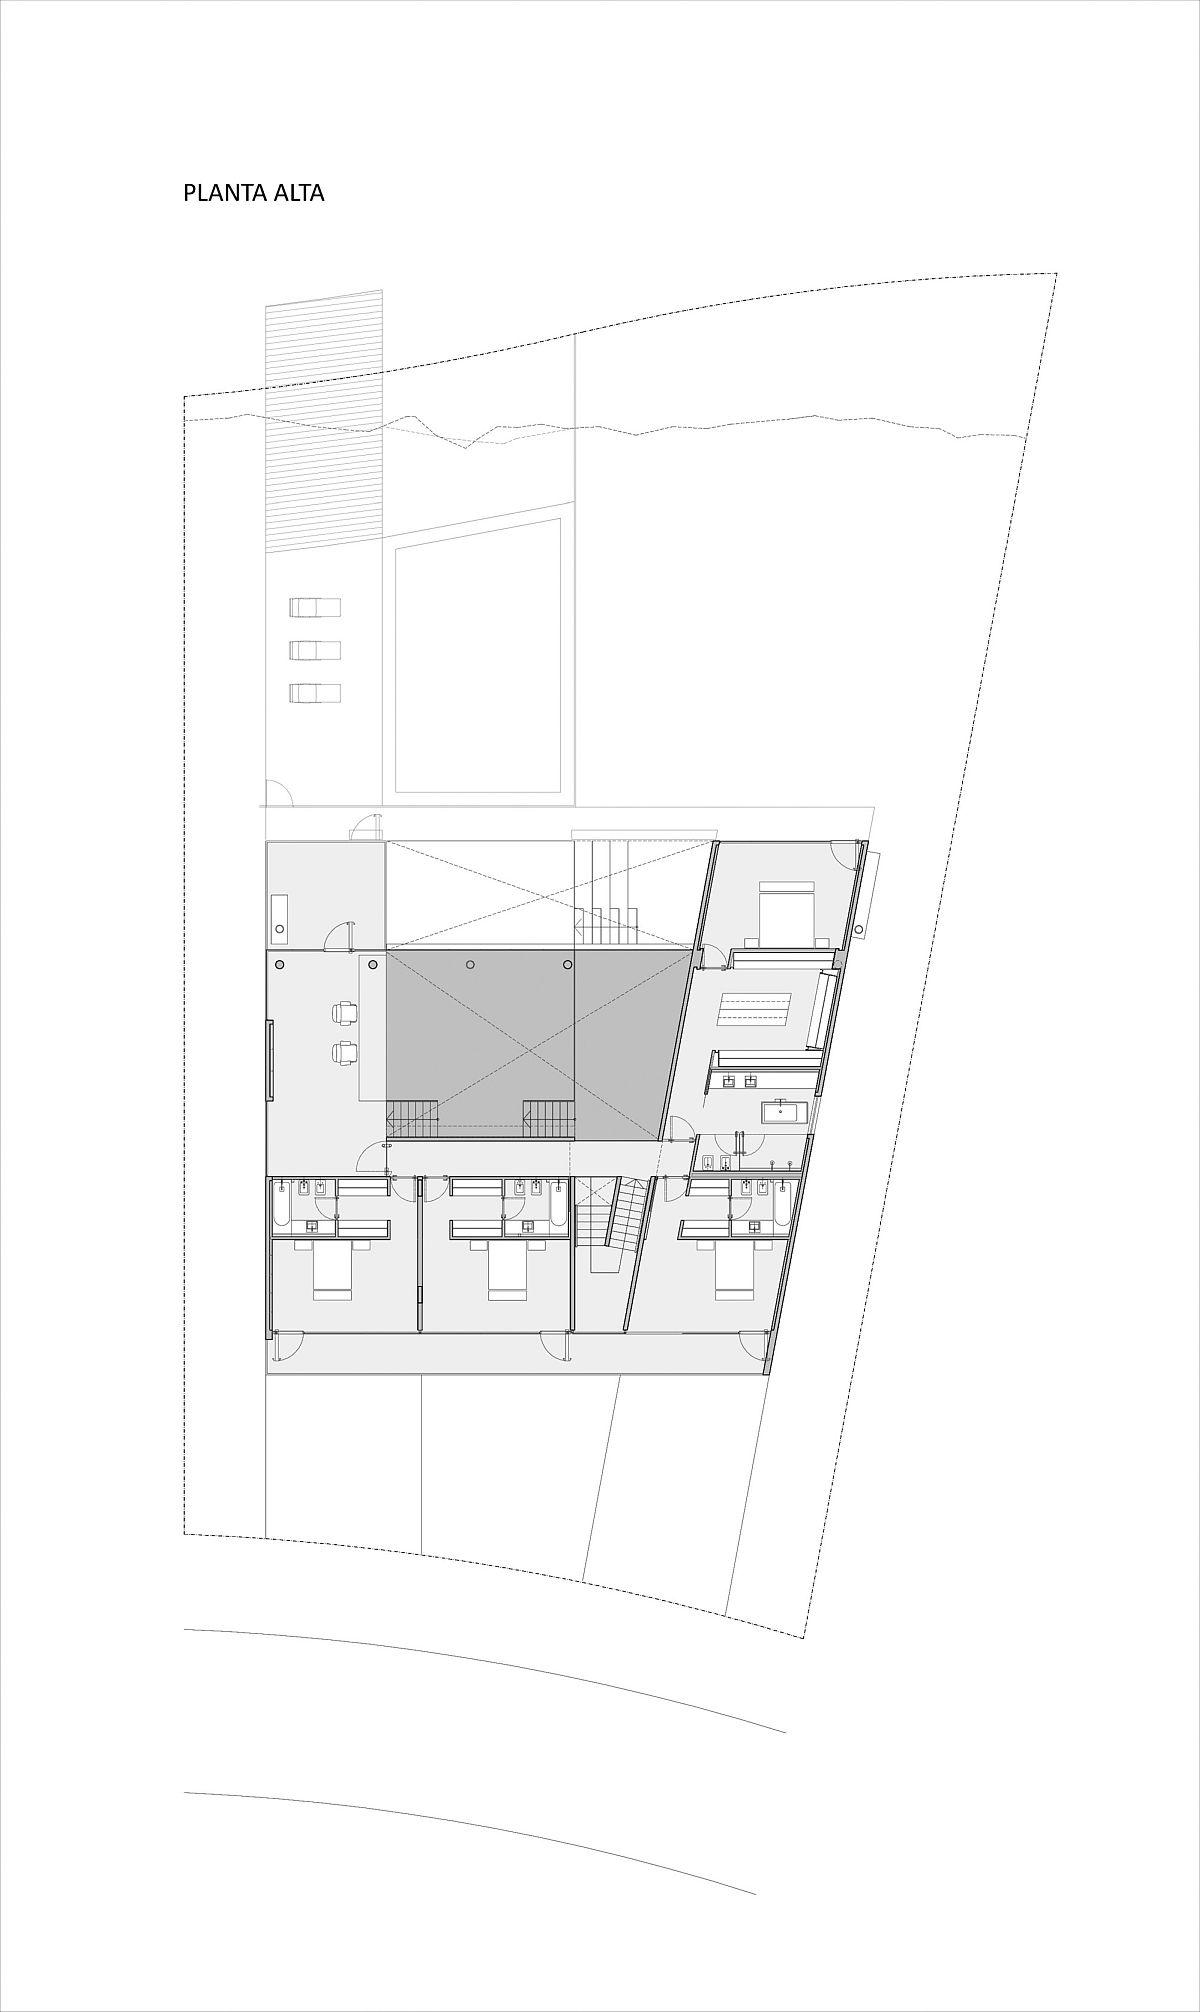 Upper-level-floor-plan-of-modern-Castores-House-in-Buenos-Aries-89130